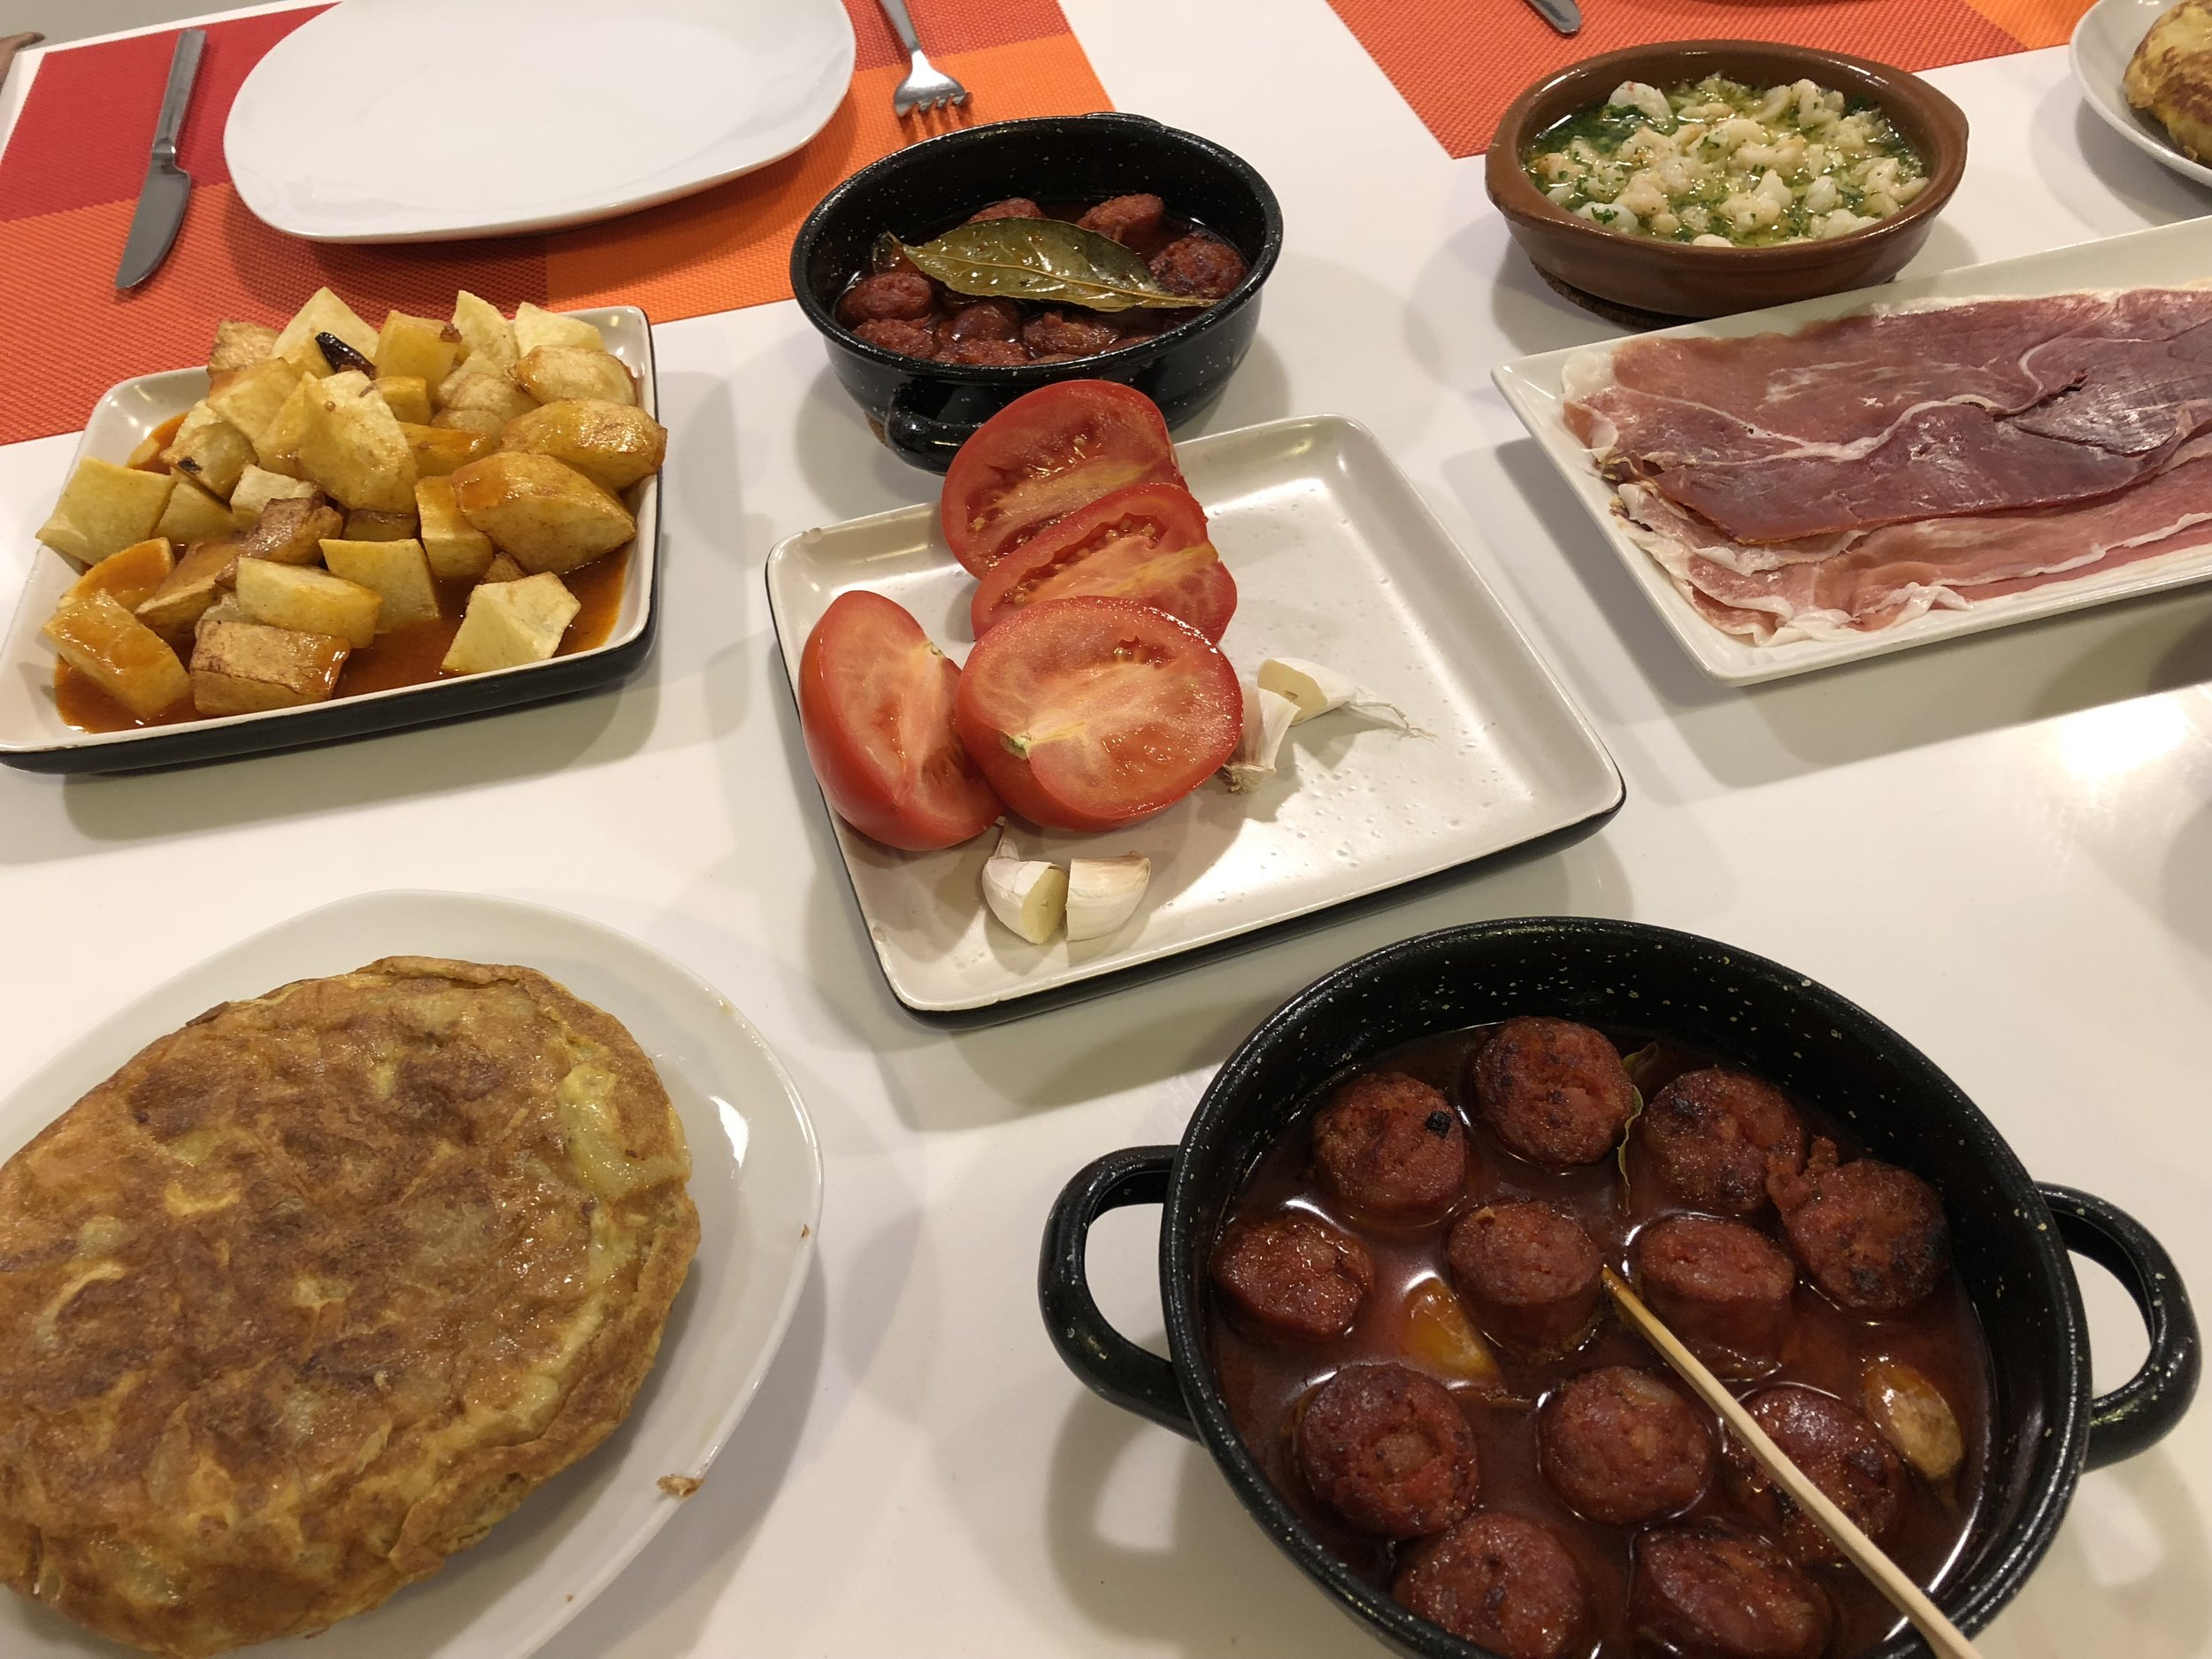 Culmination of our Spanish cooking class!Patatas Bravas, Marinated Chorizos, Garlic Shrimp, Iberico Ham, Tomato Bread, Spanish Omlette.